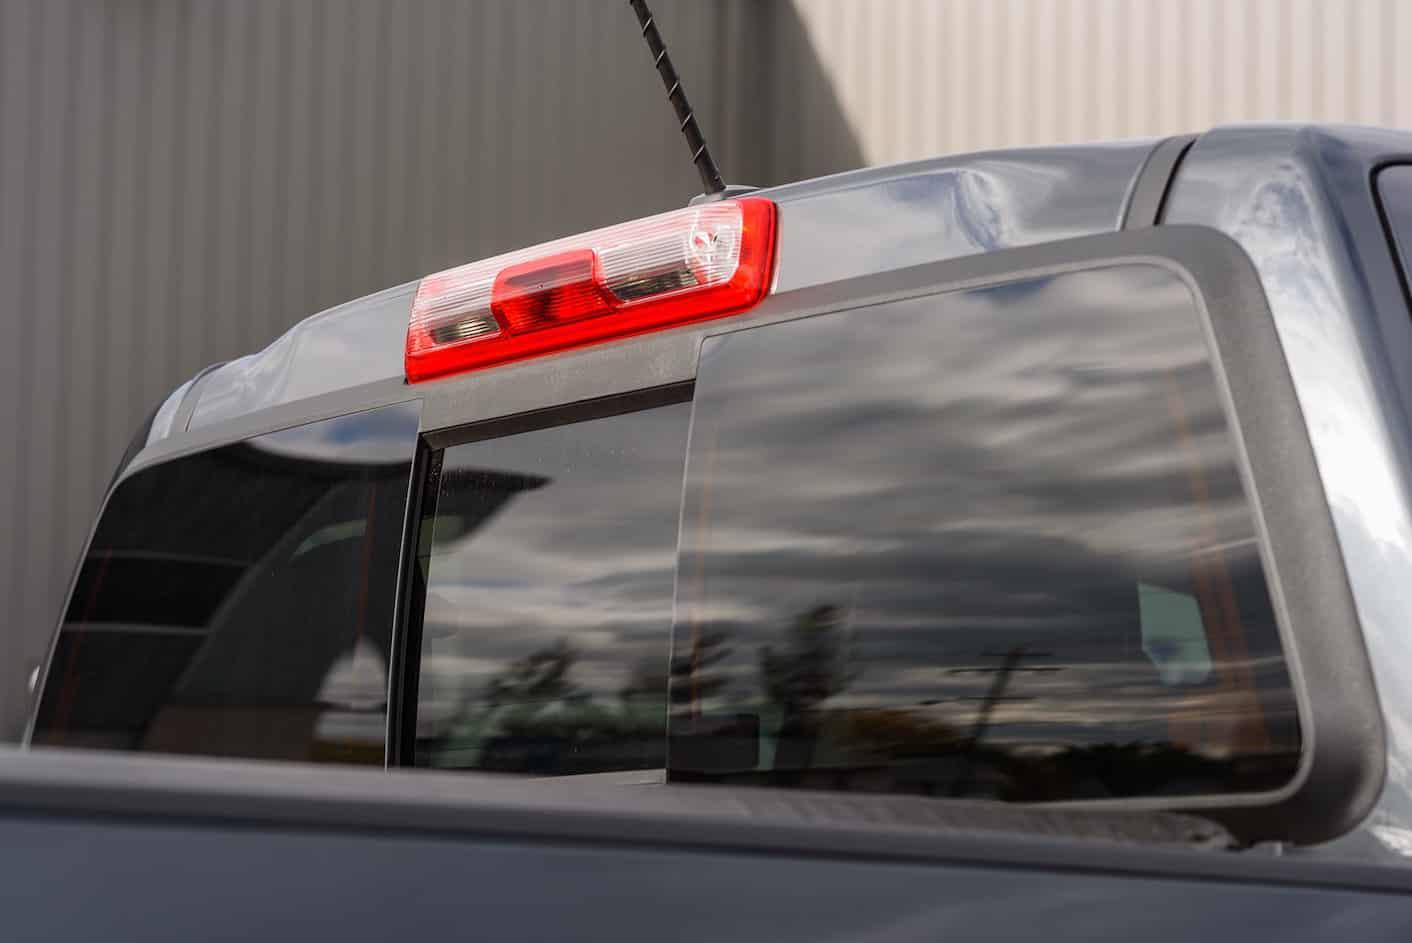 Automotive Glass Repair Services | Tri City Glass & Door